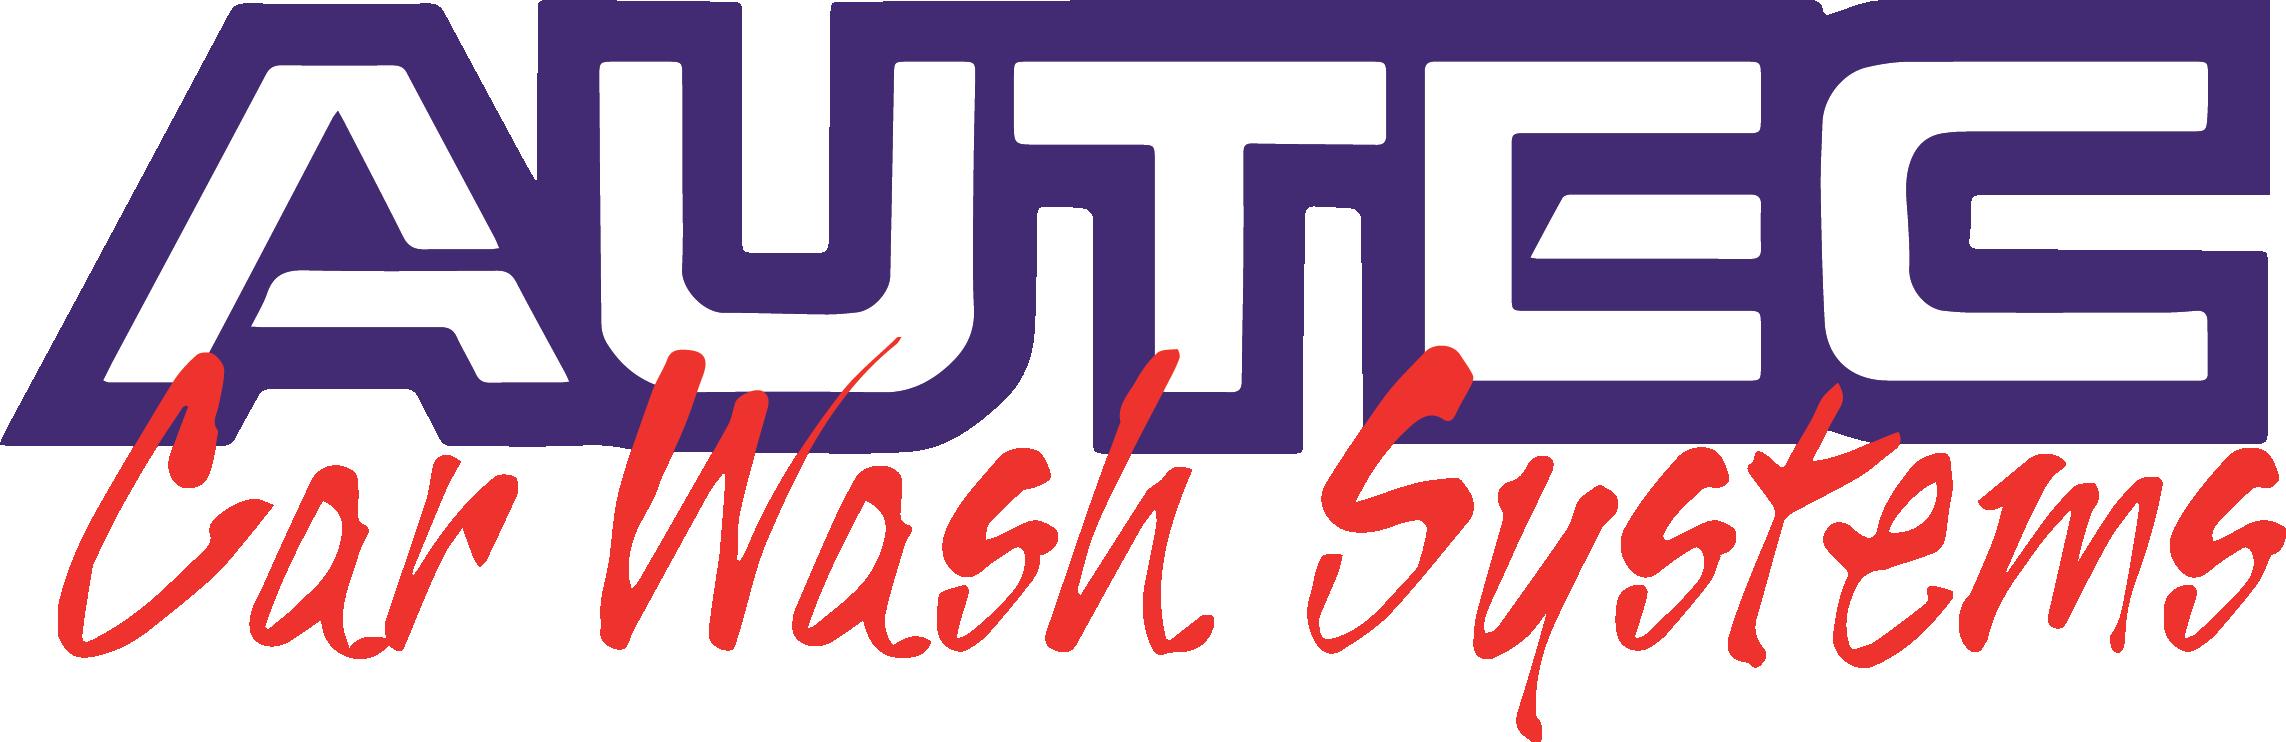 AUTEC Car Wash Systems